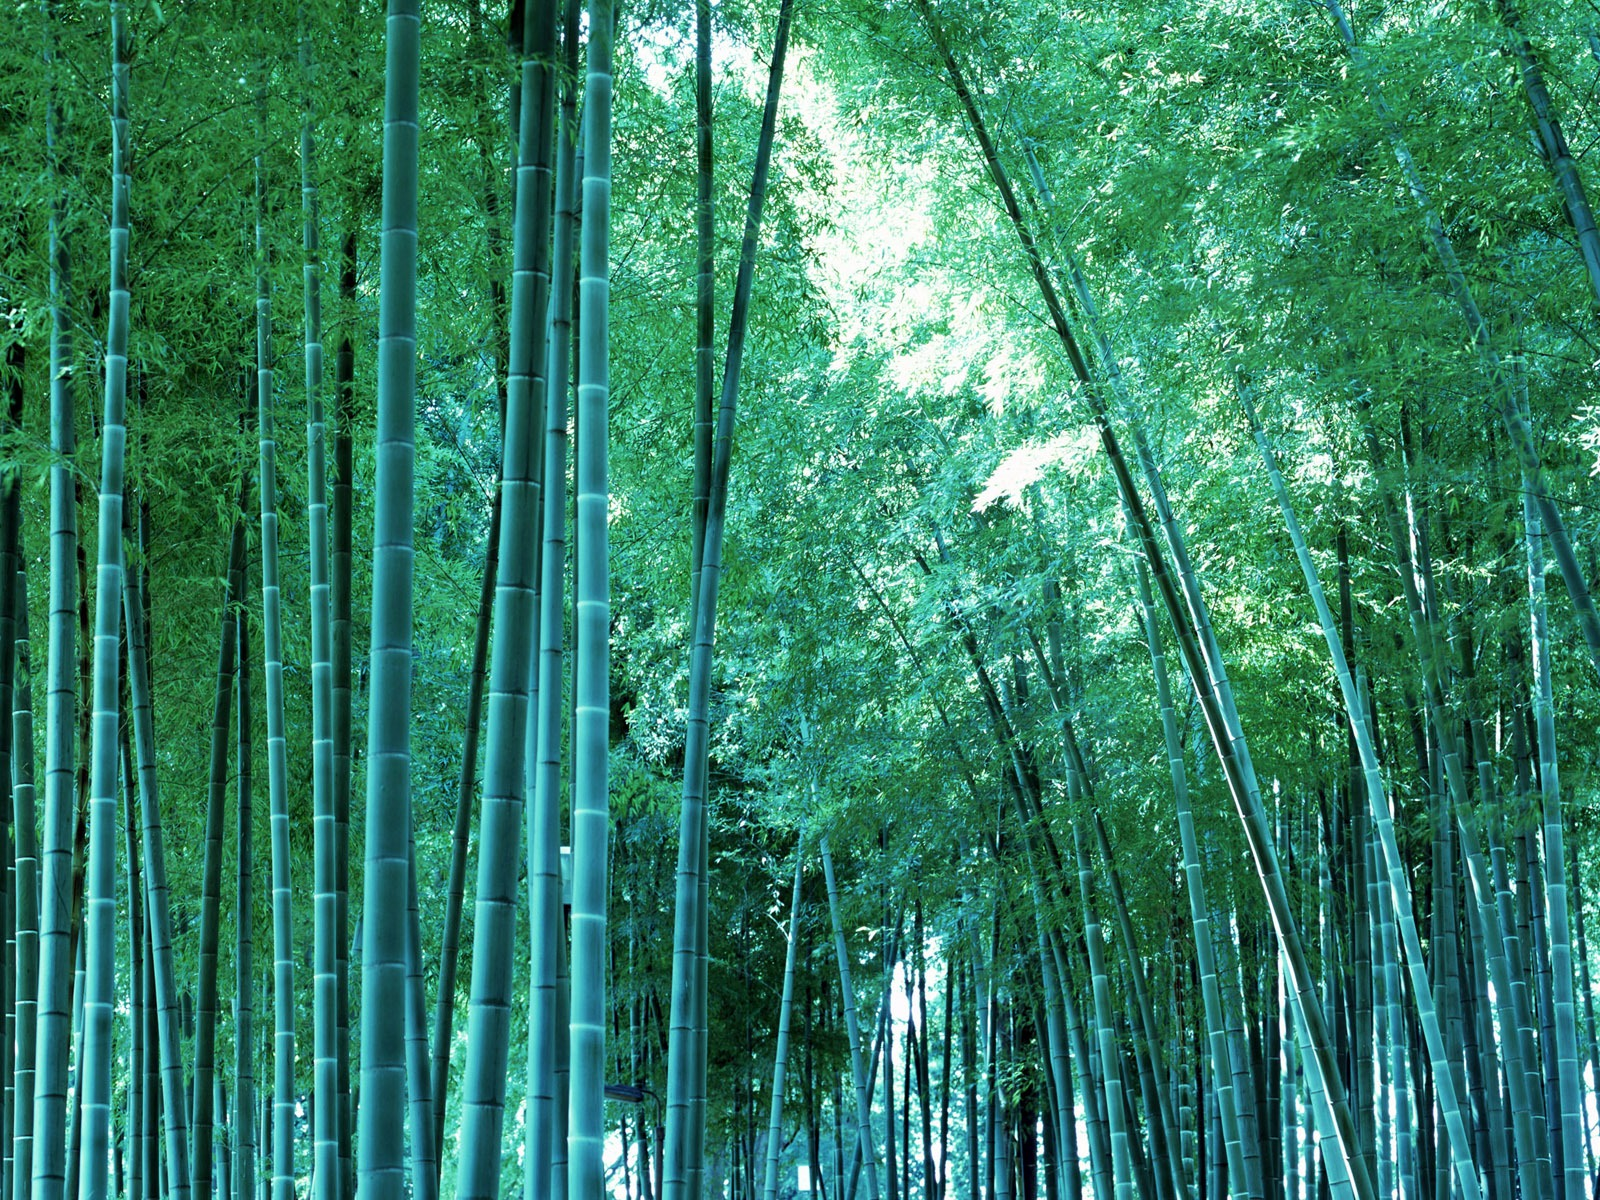 http://4.bp.blogspot.com/-A-WW5SBok4I/TqKadi4sAMI/AAAAAAAABIA/e057UEHy2Jk/s1600/bamboo_print_wallpaper.jpg